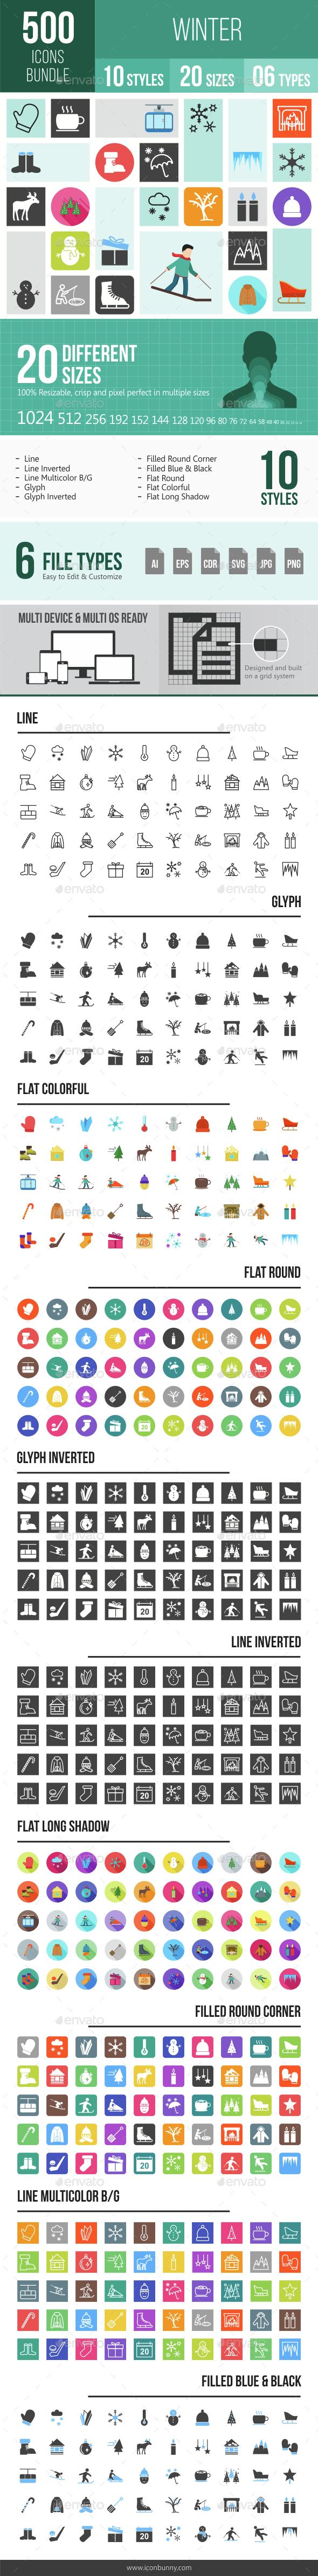 500 Winter Icons Bundle - Icons